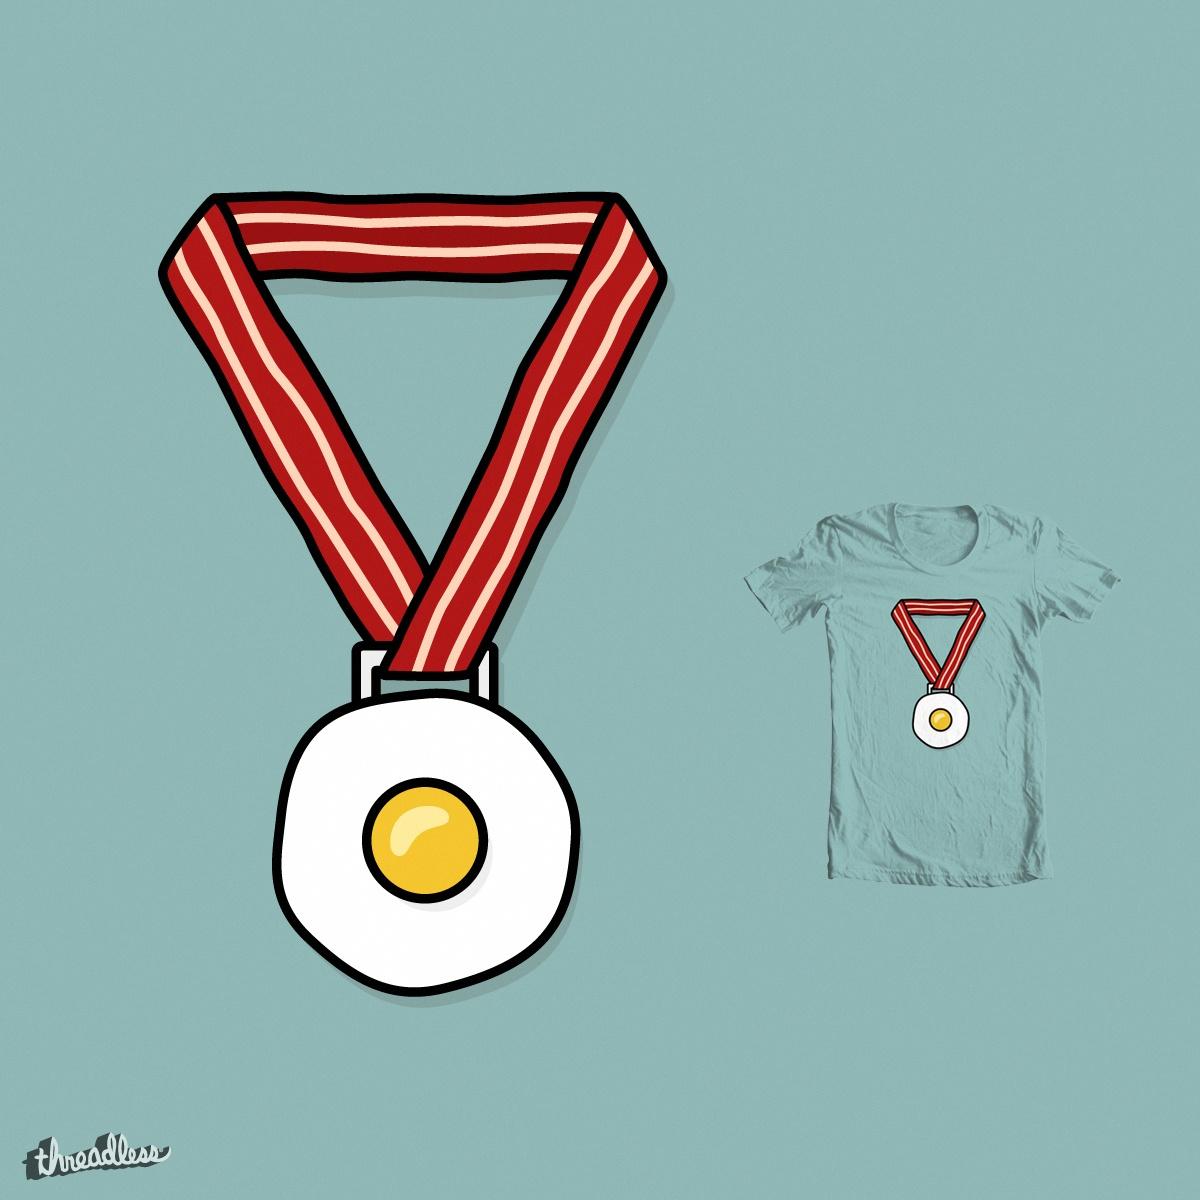 Breakfast of Champions by Haasbroek on Threadless